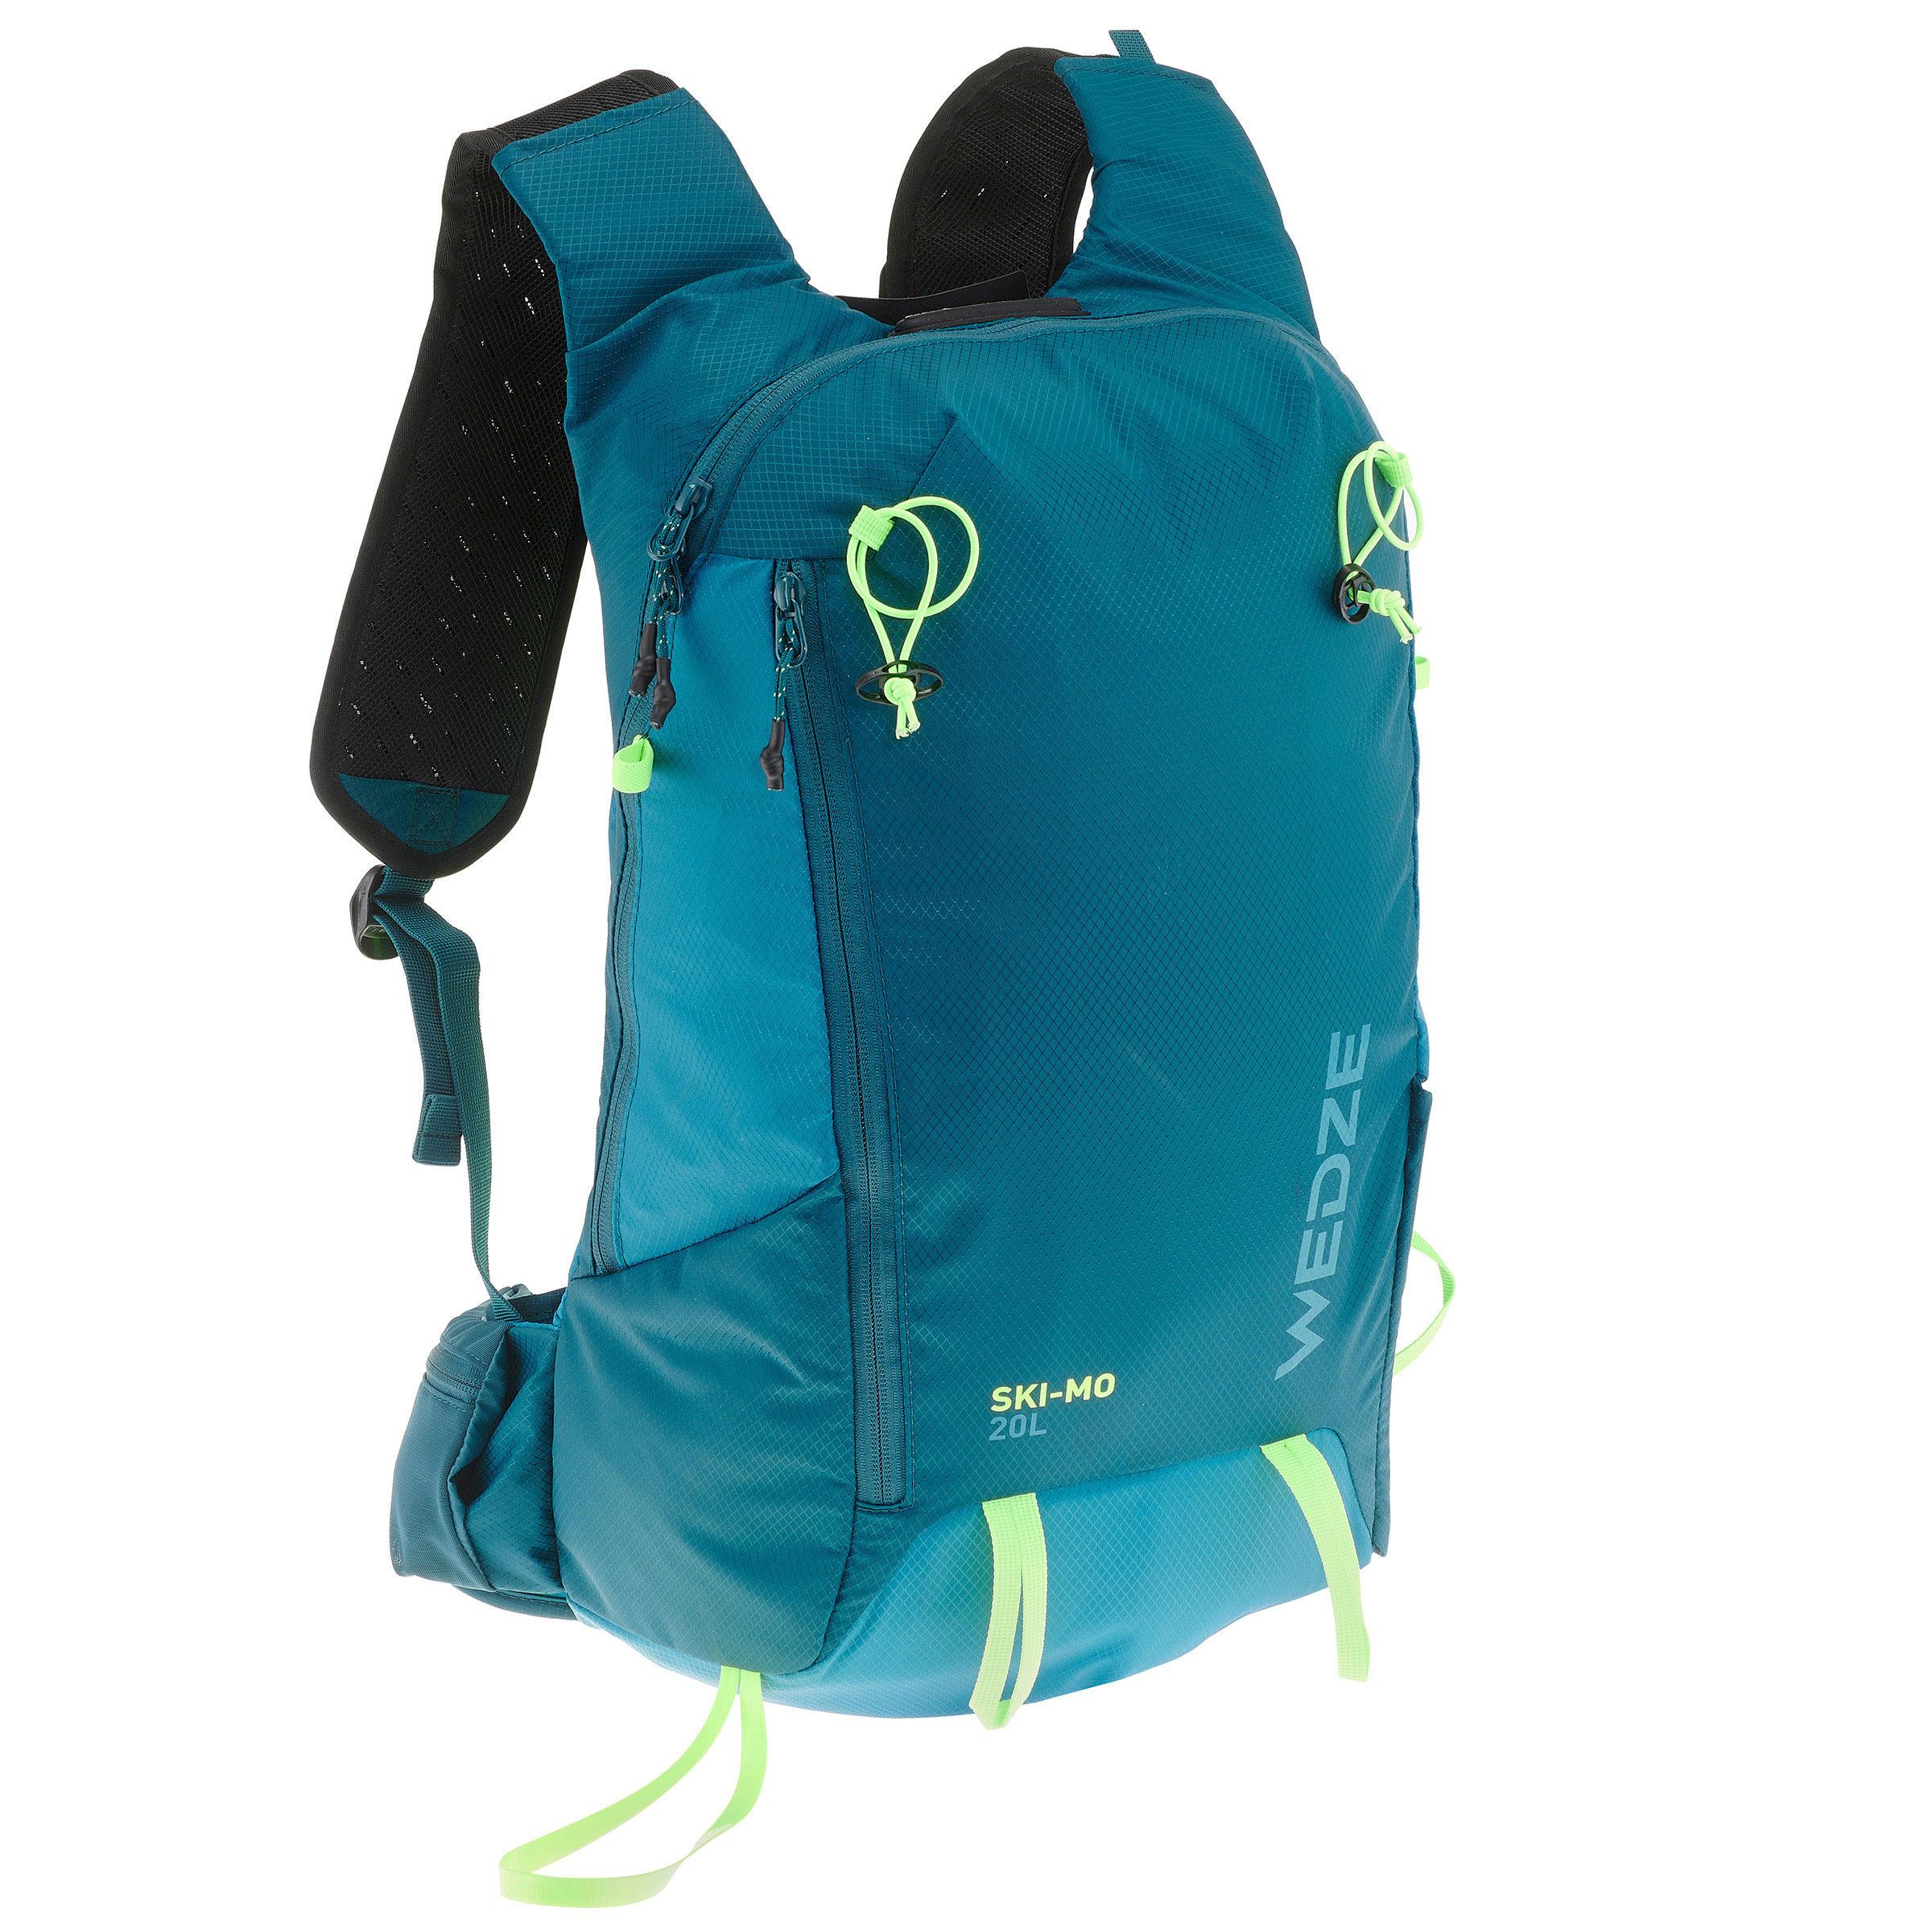 Damen,Herren Tourenski-Rucksack Backback Ski-Mo 20 Liter | 03608449848176